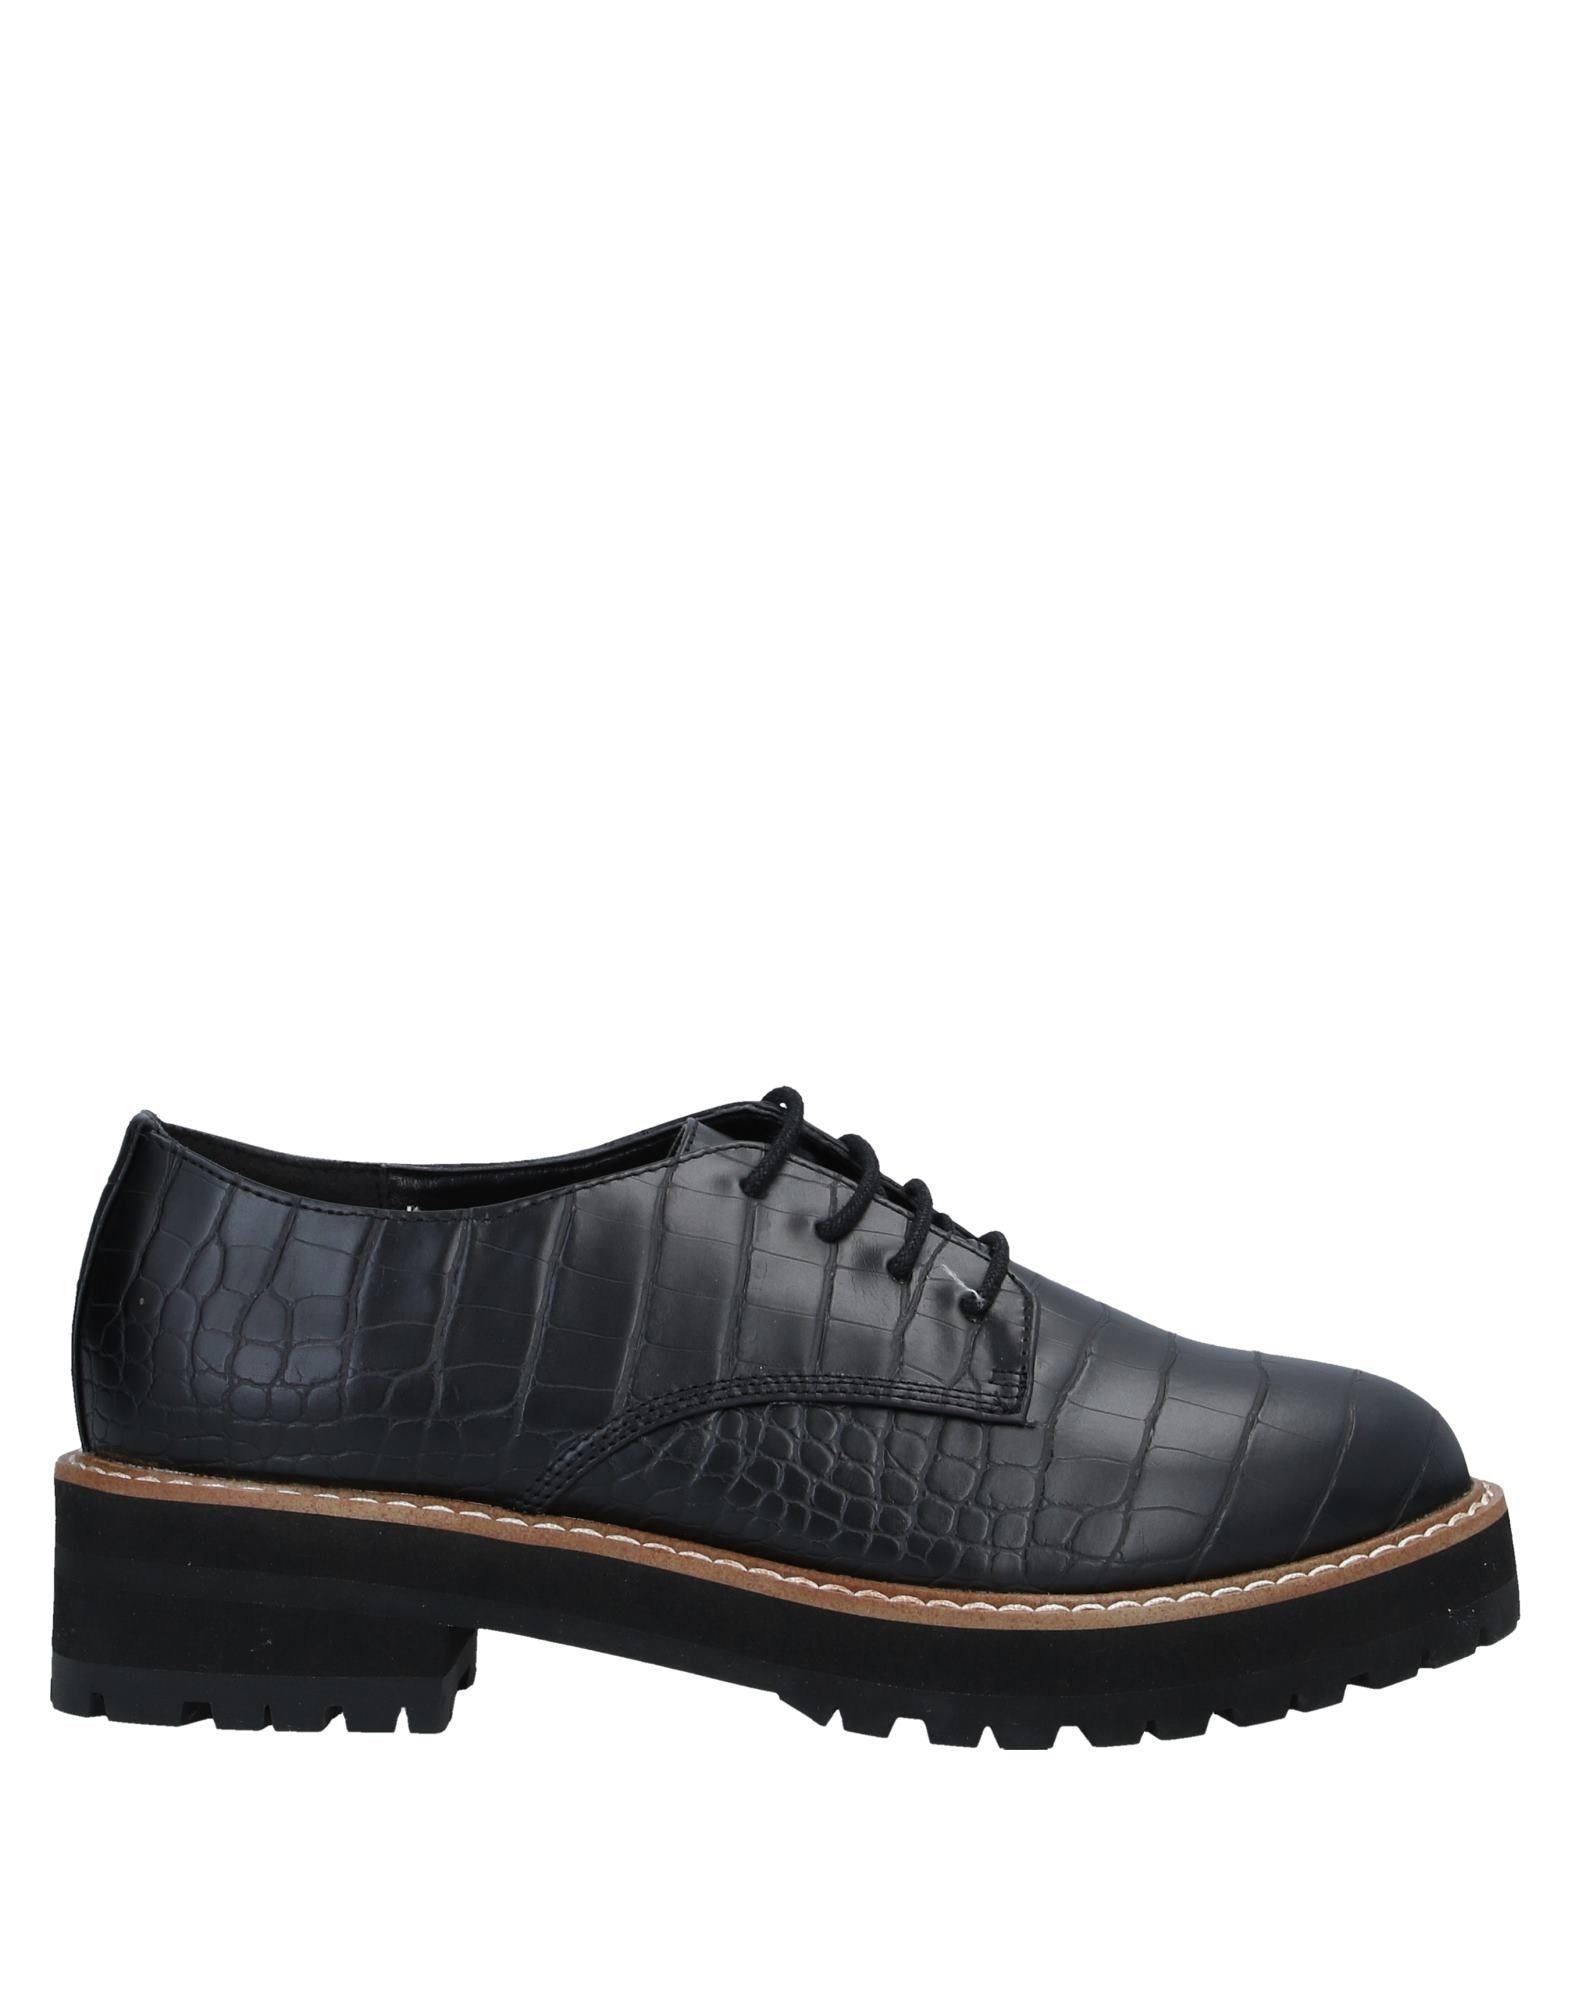 STEVE MADDEN Обувь на шнурках steve madden обувь на шнурках